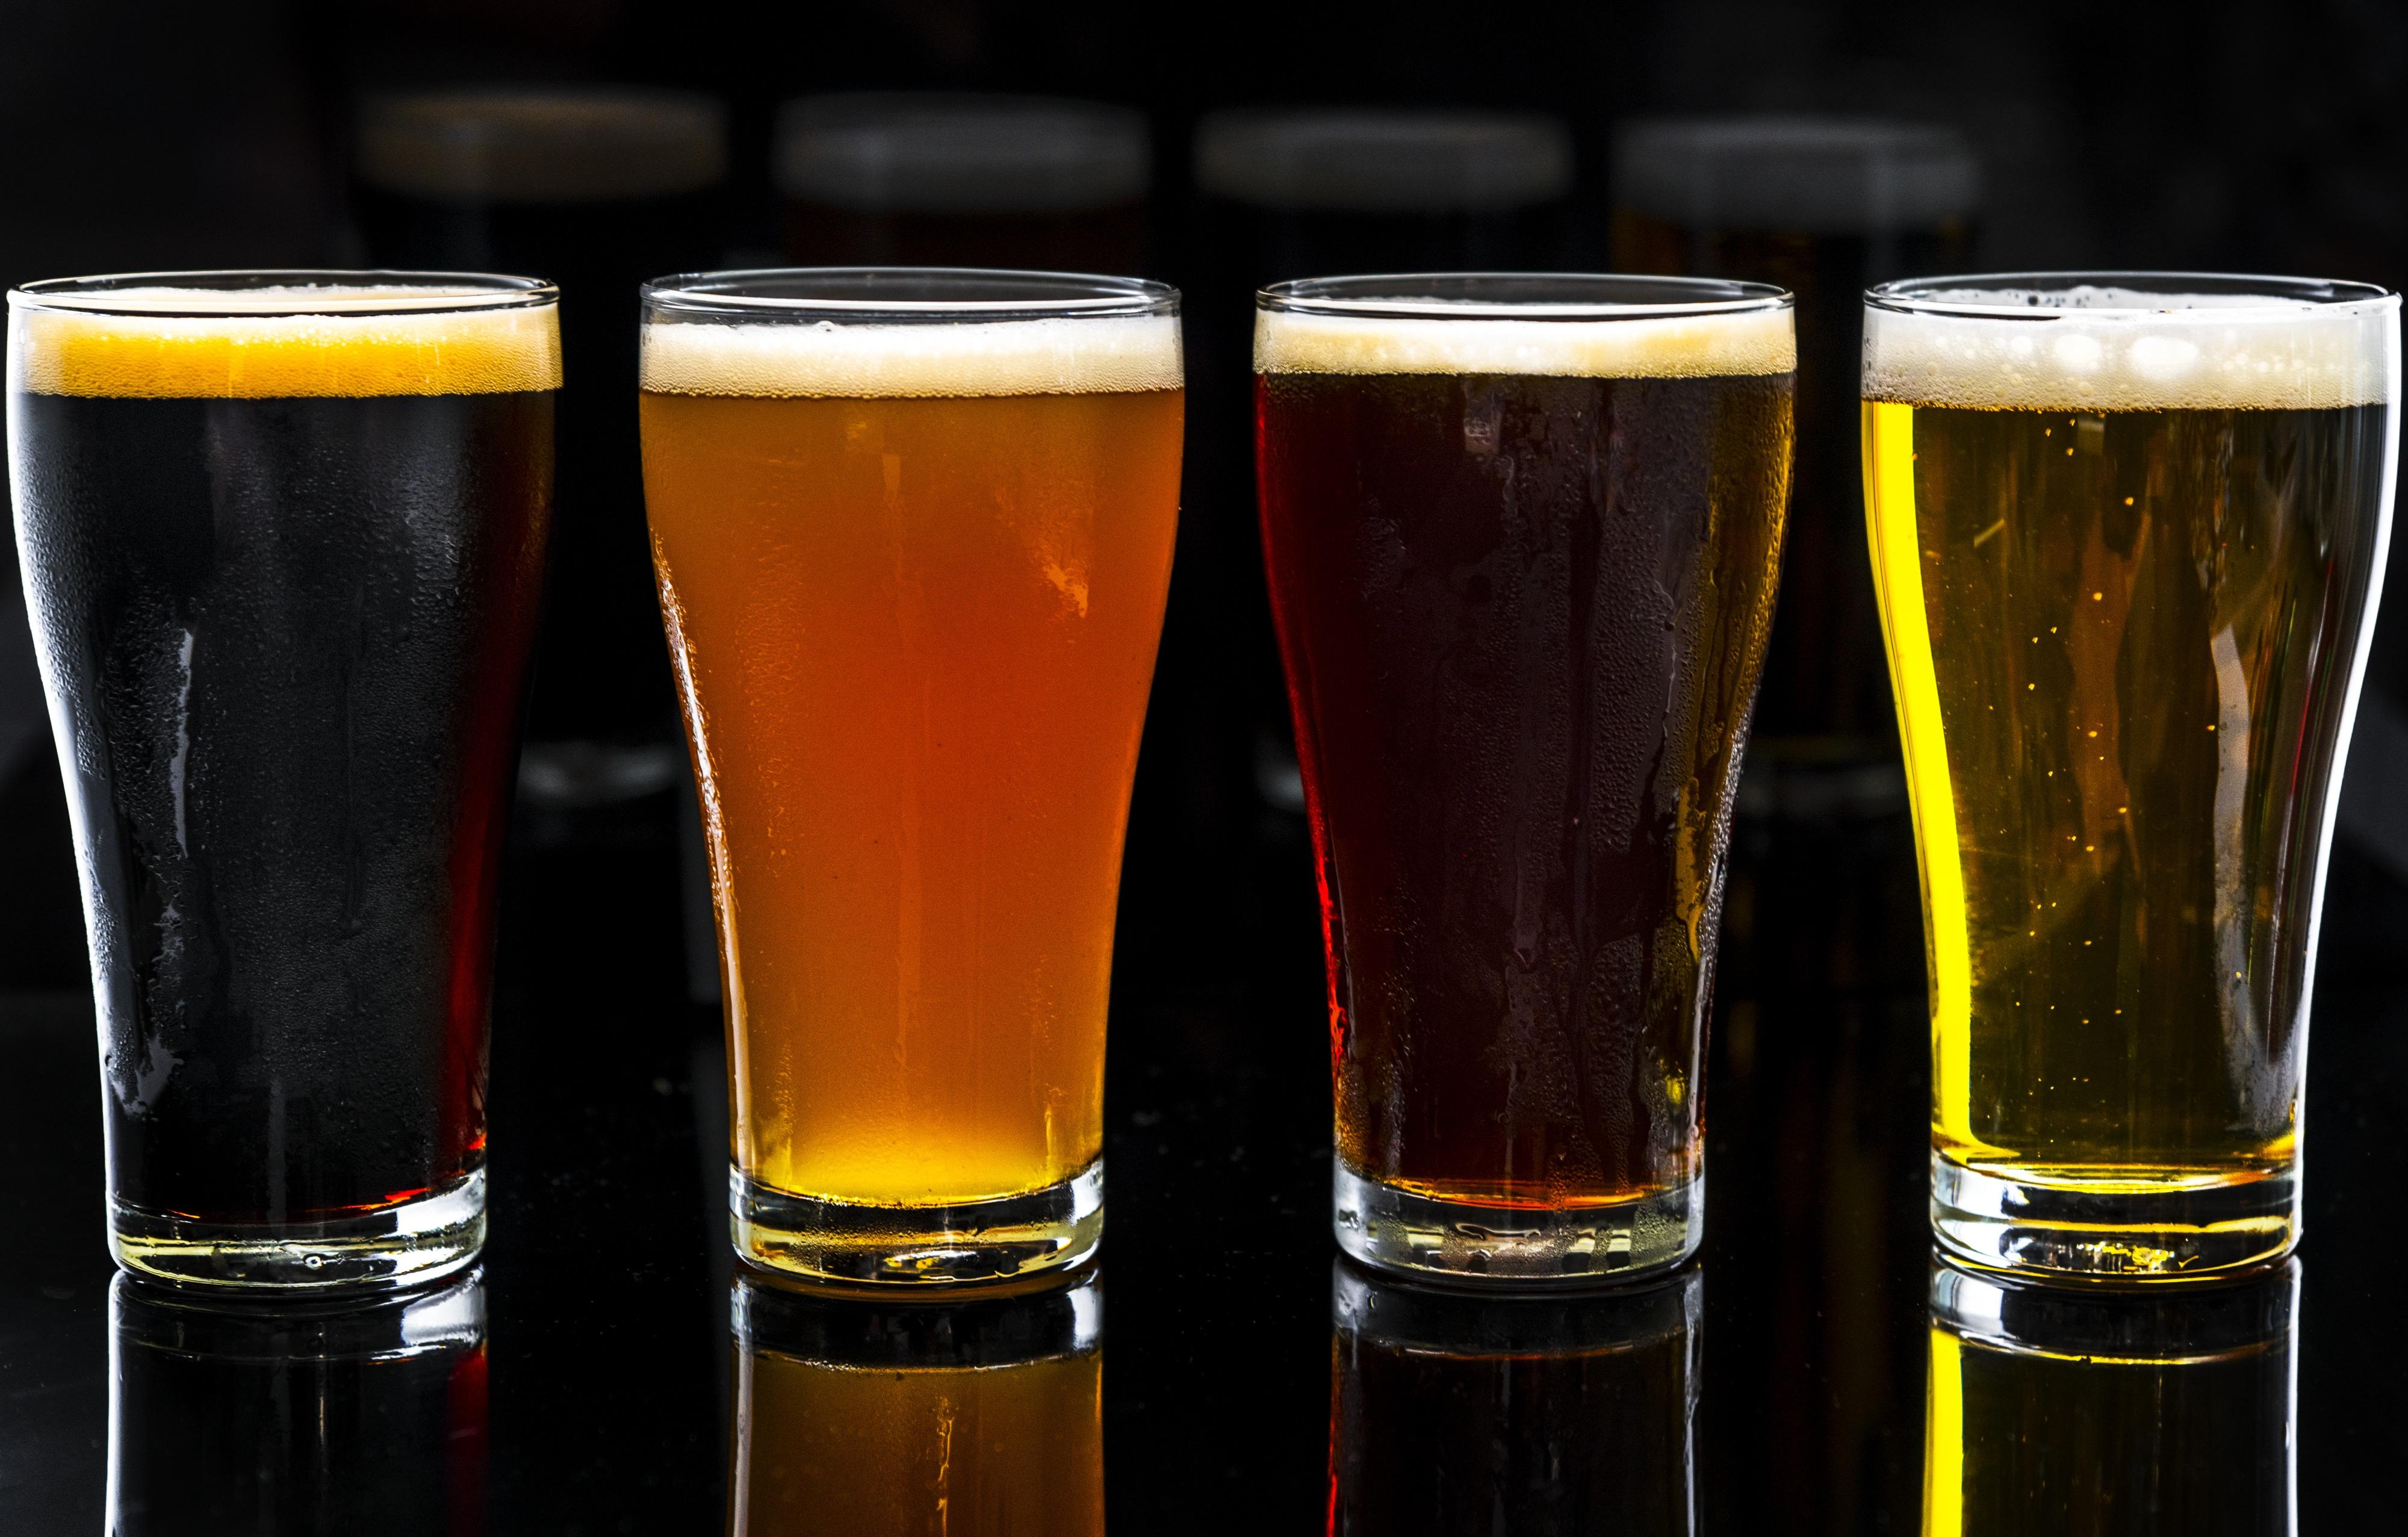 Exposicion de cervezas